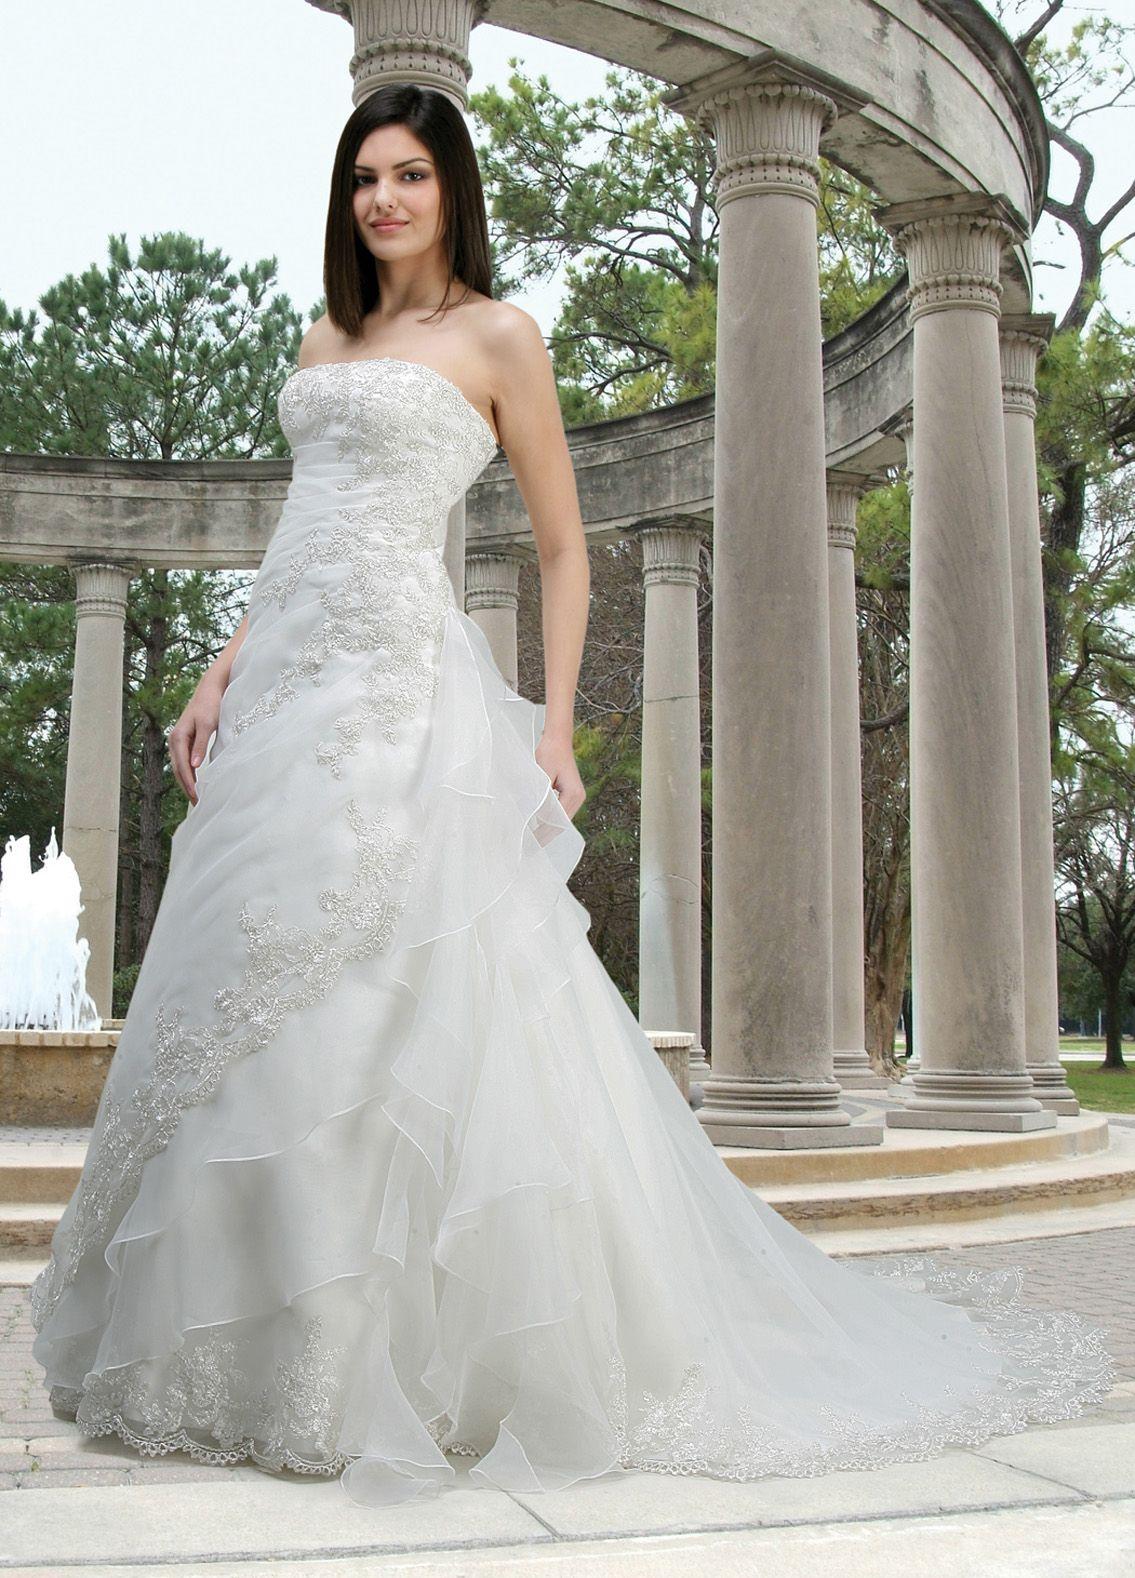 Wedding dresses bridesmaid dresses prom dresses quinceneara